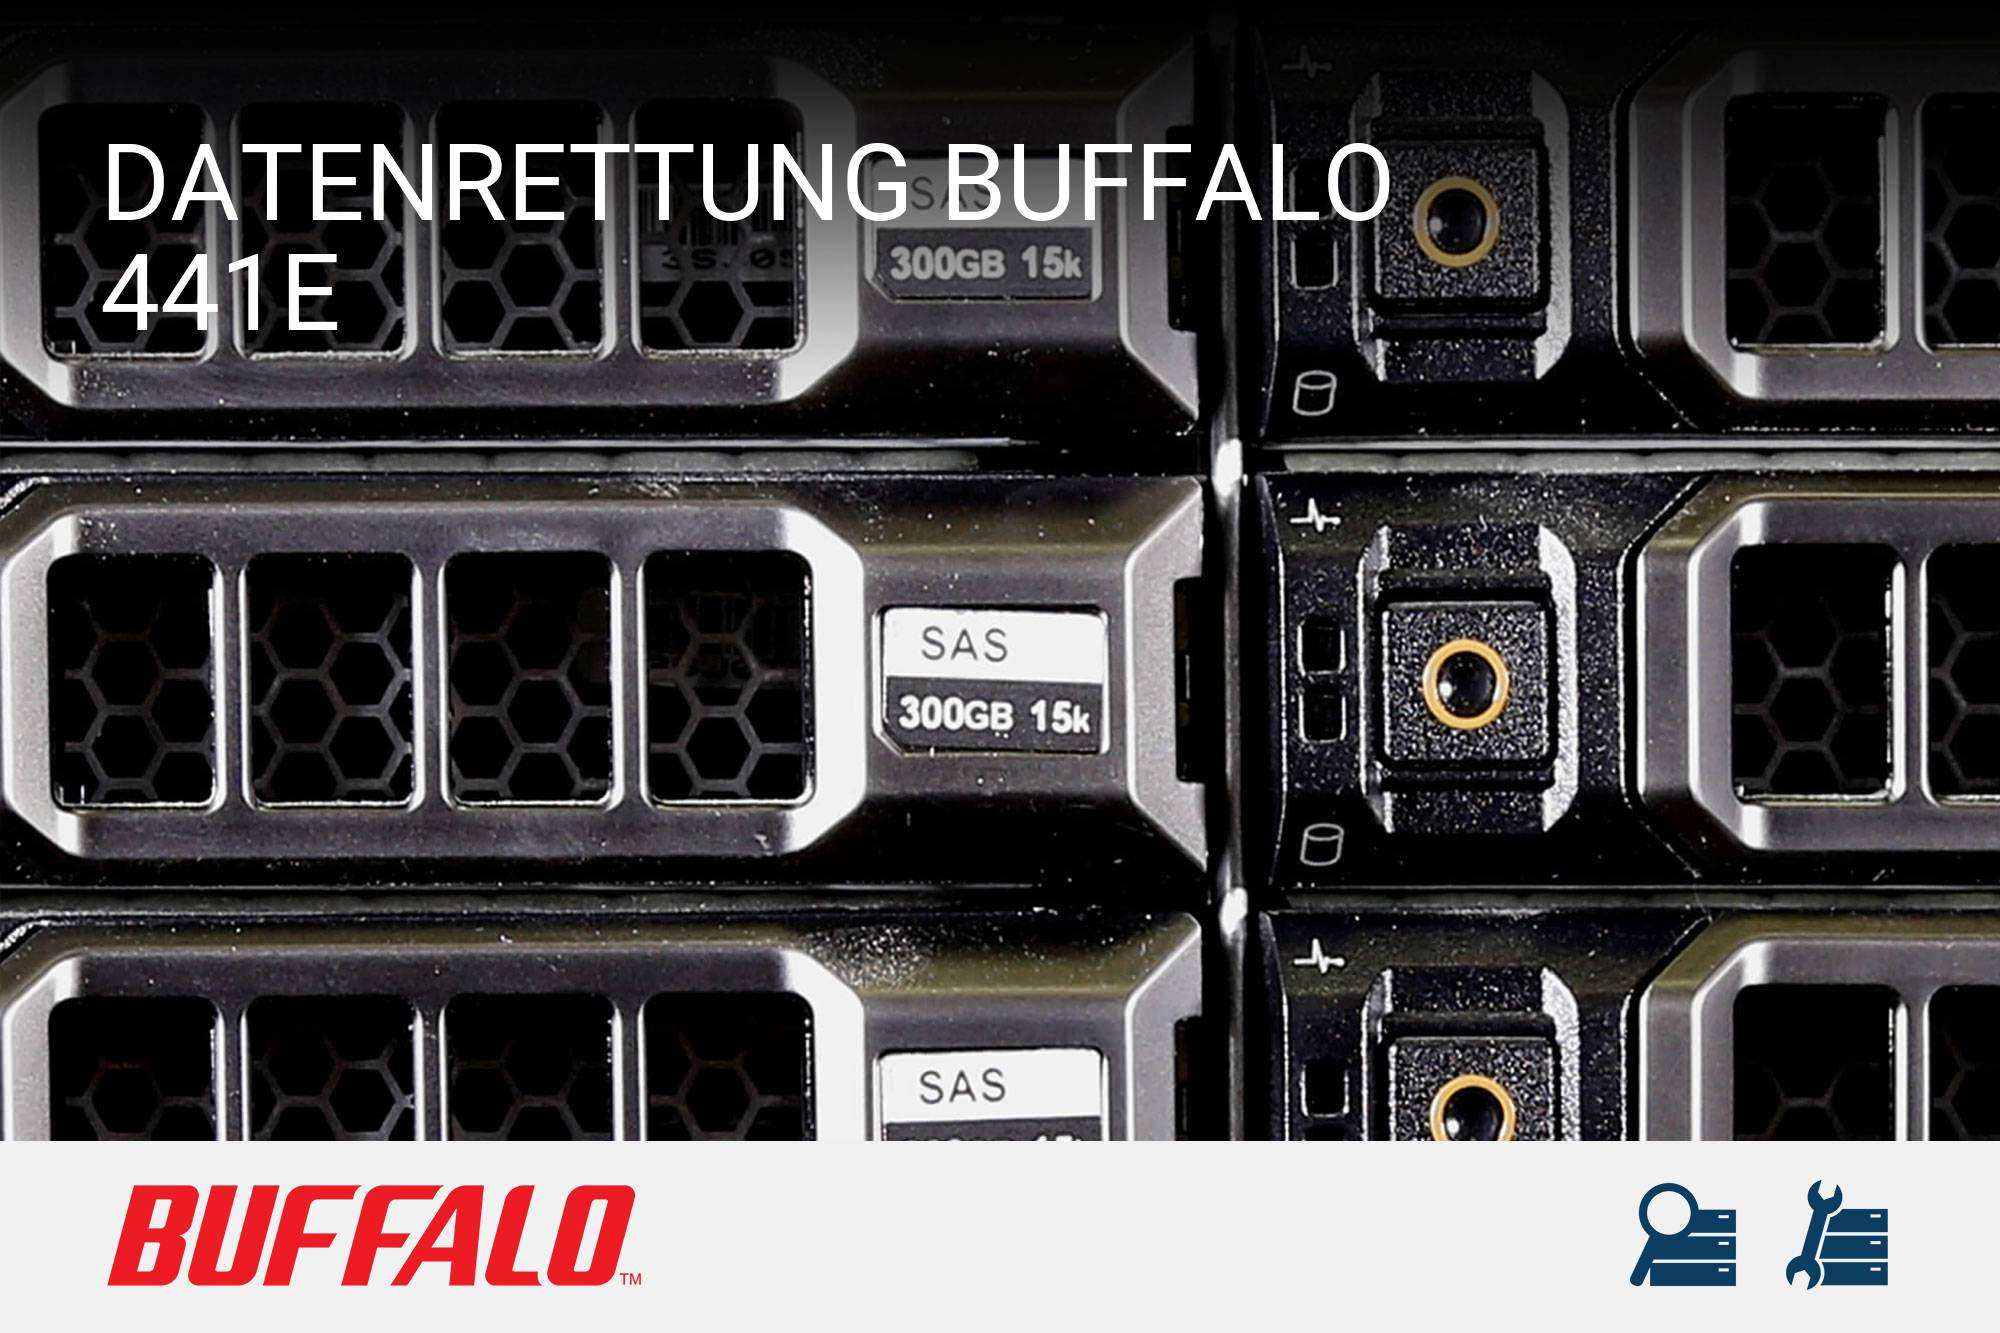 Buffalo 441e